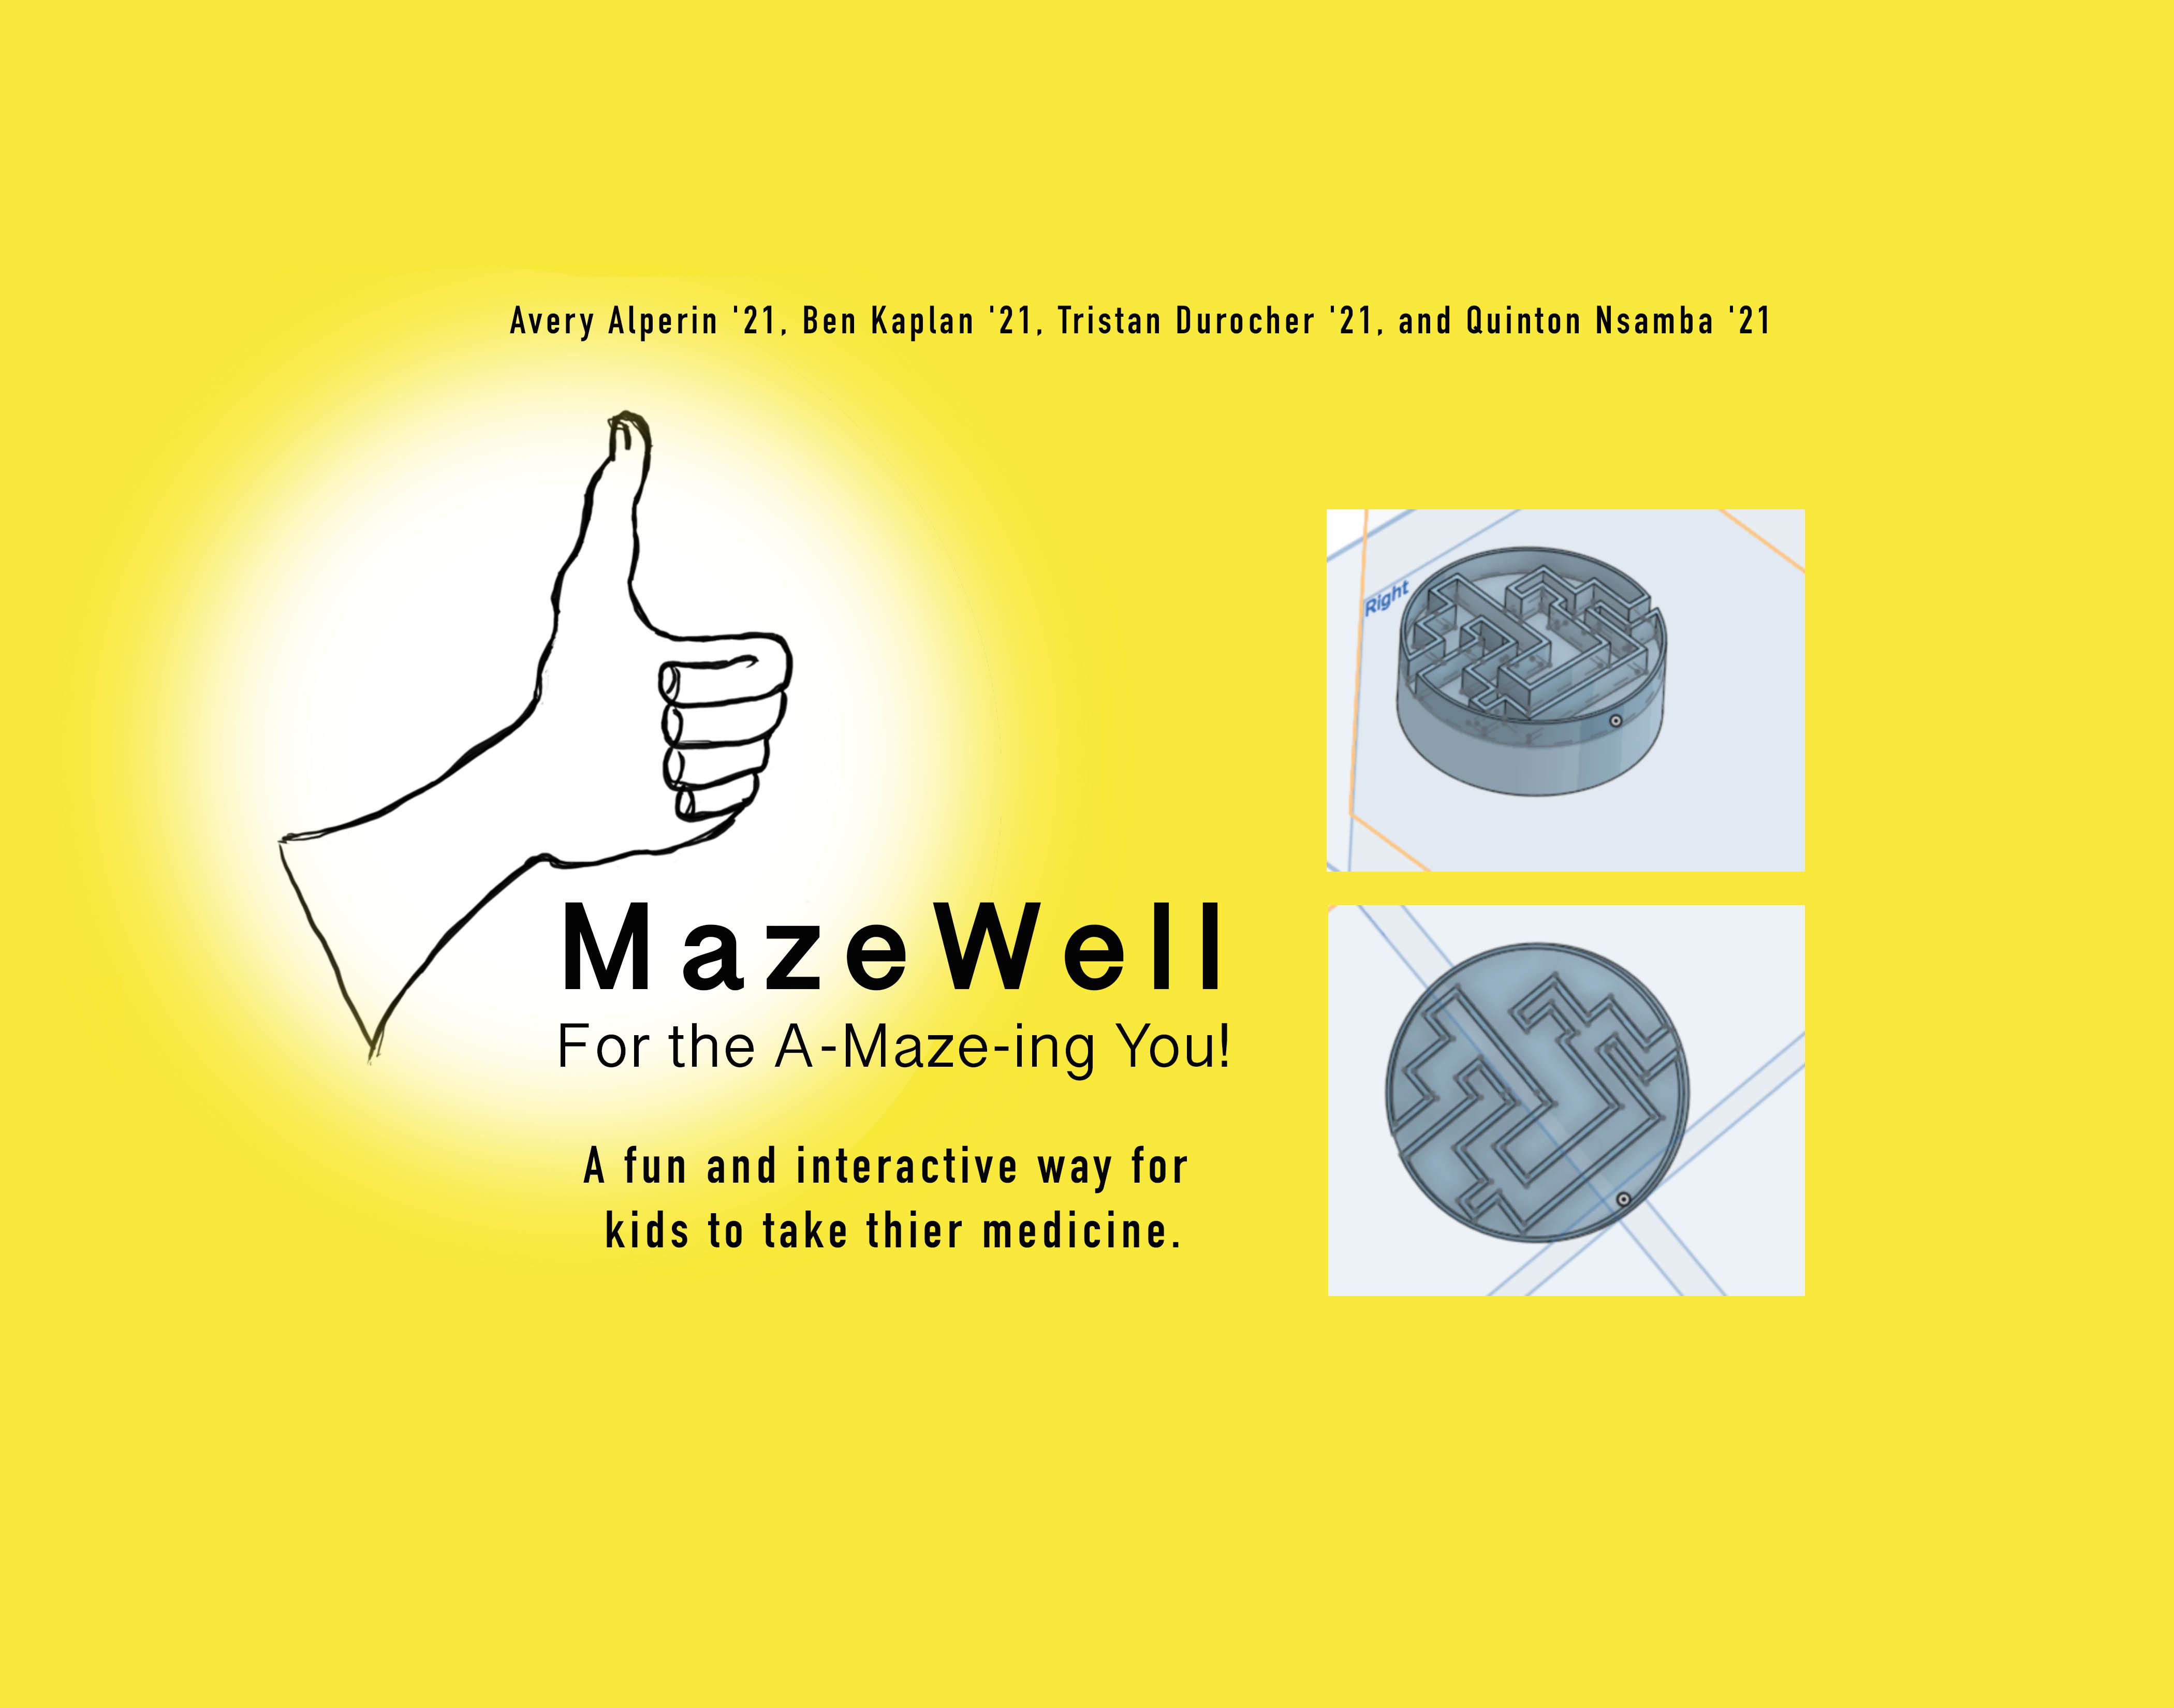 MazeWell